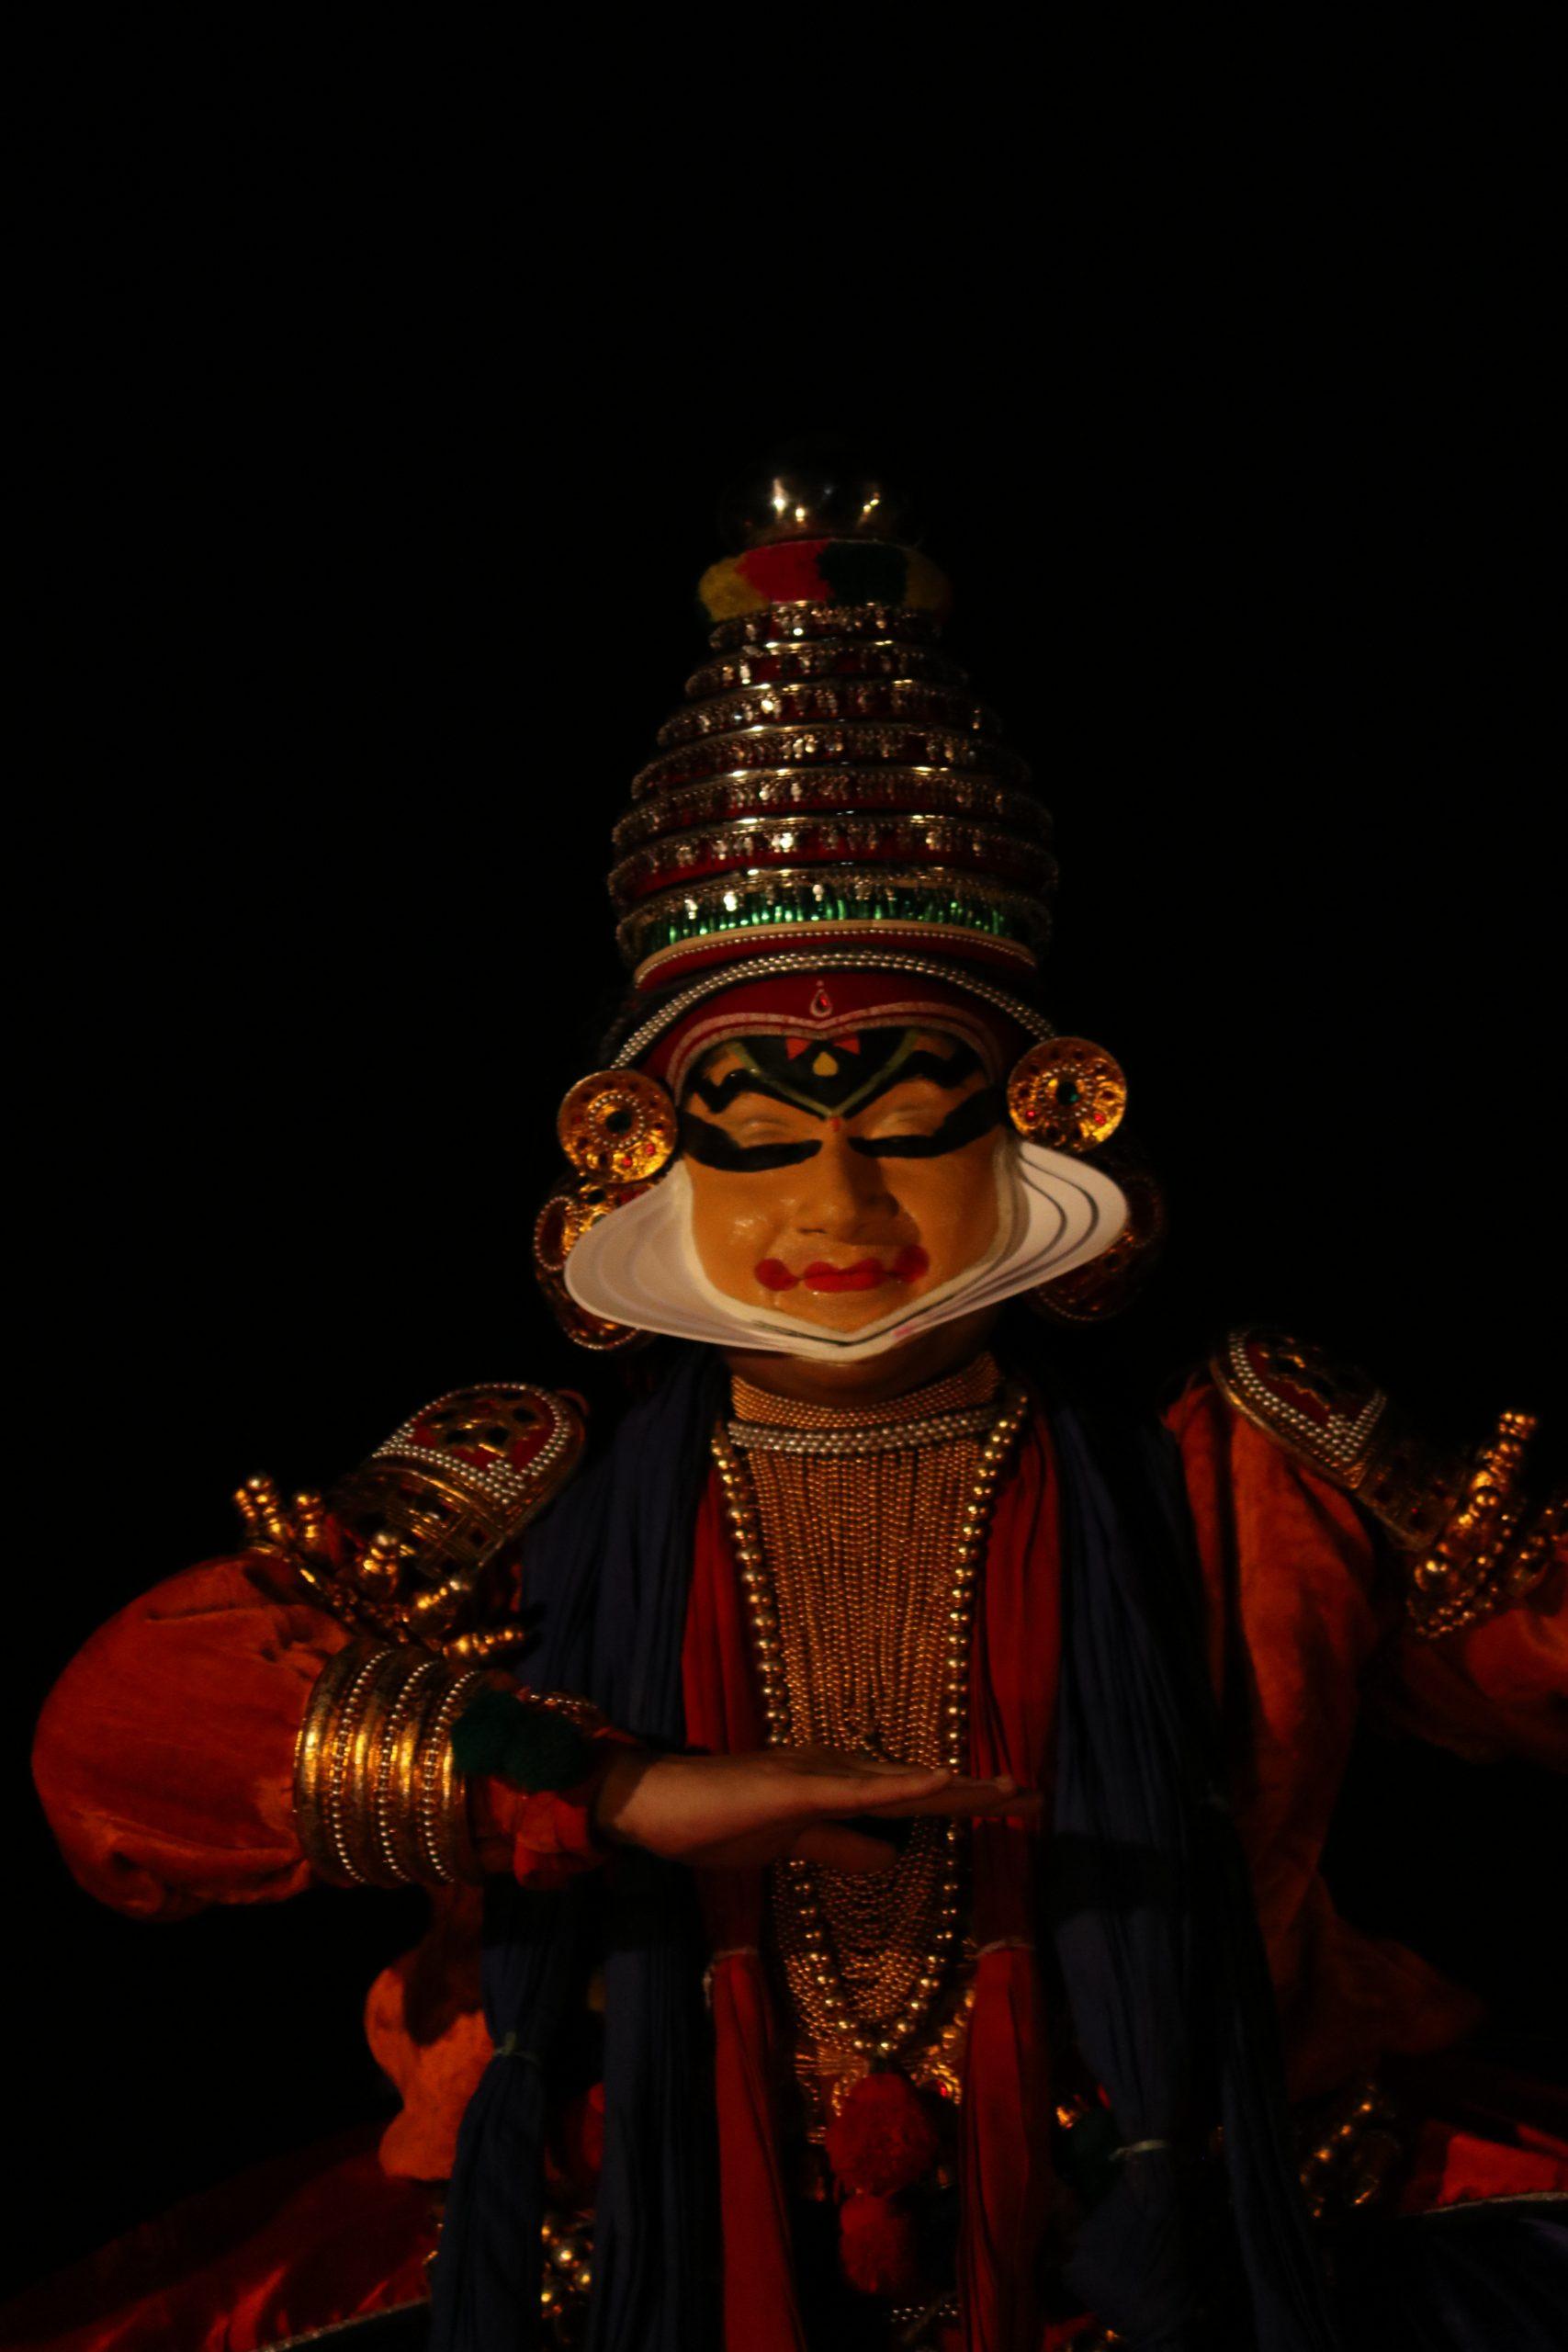 portrait of a kathakali artist